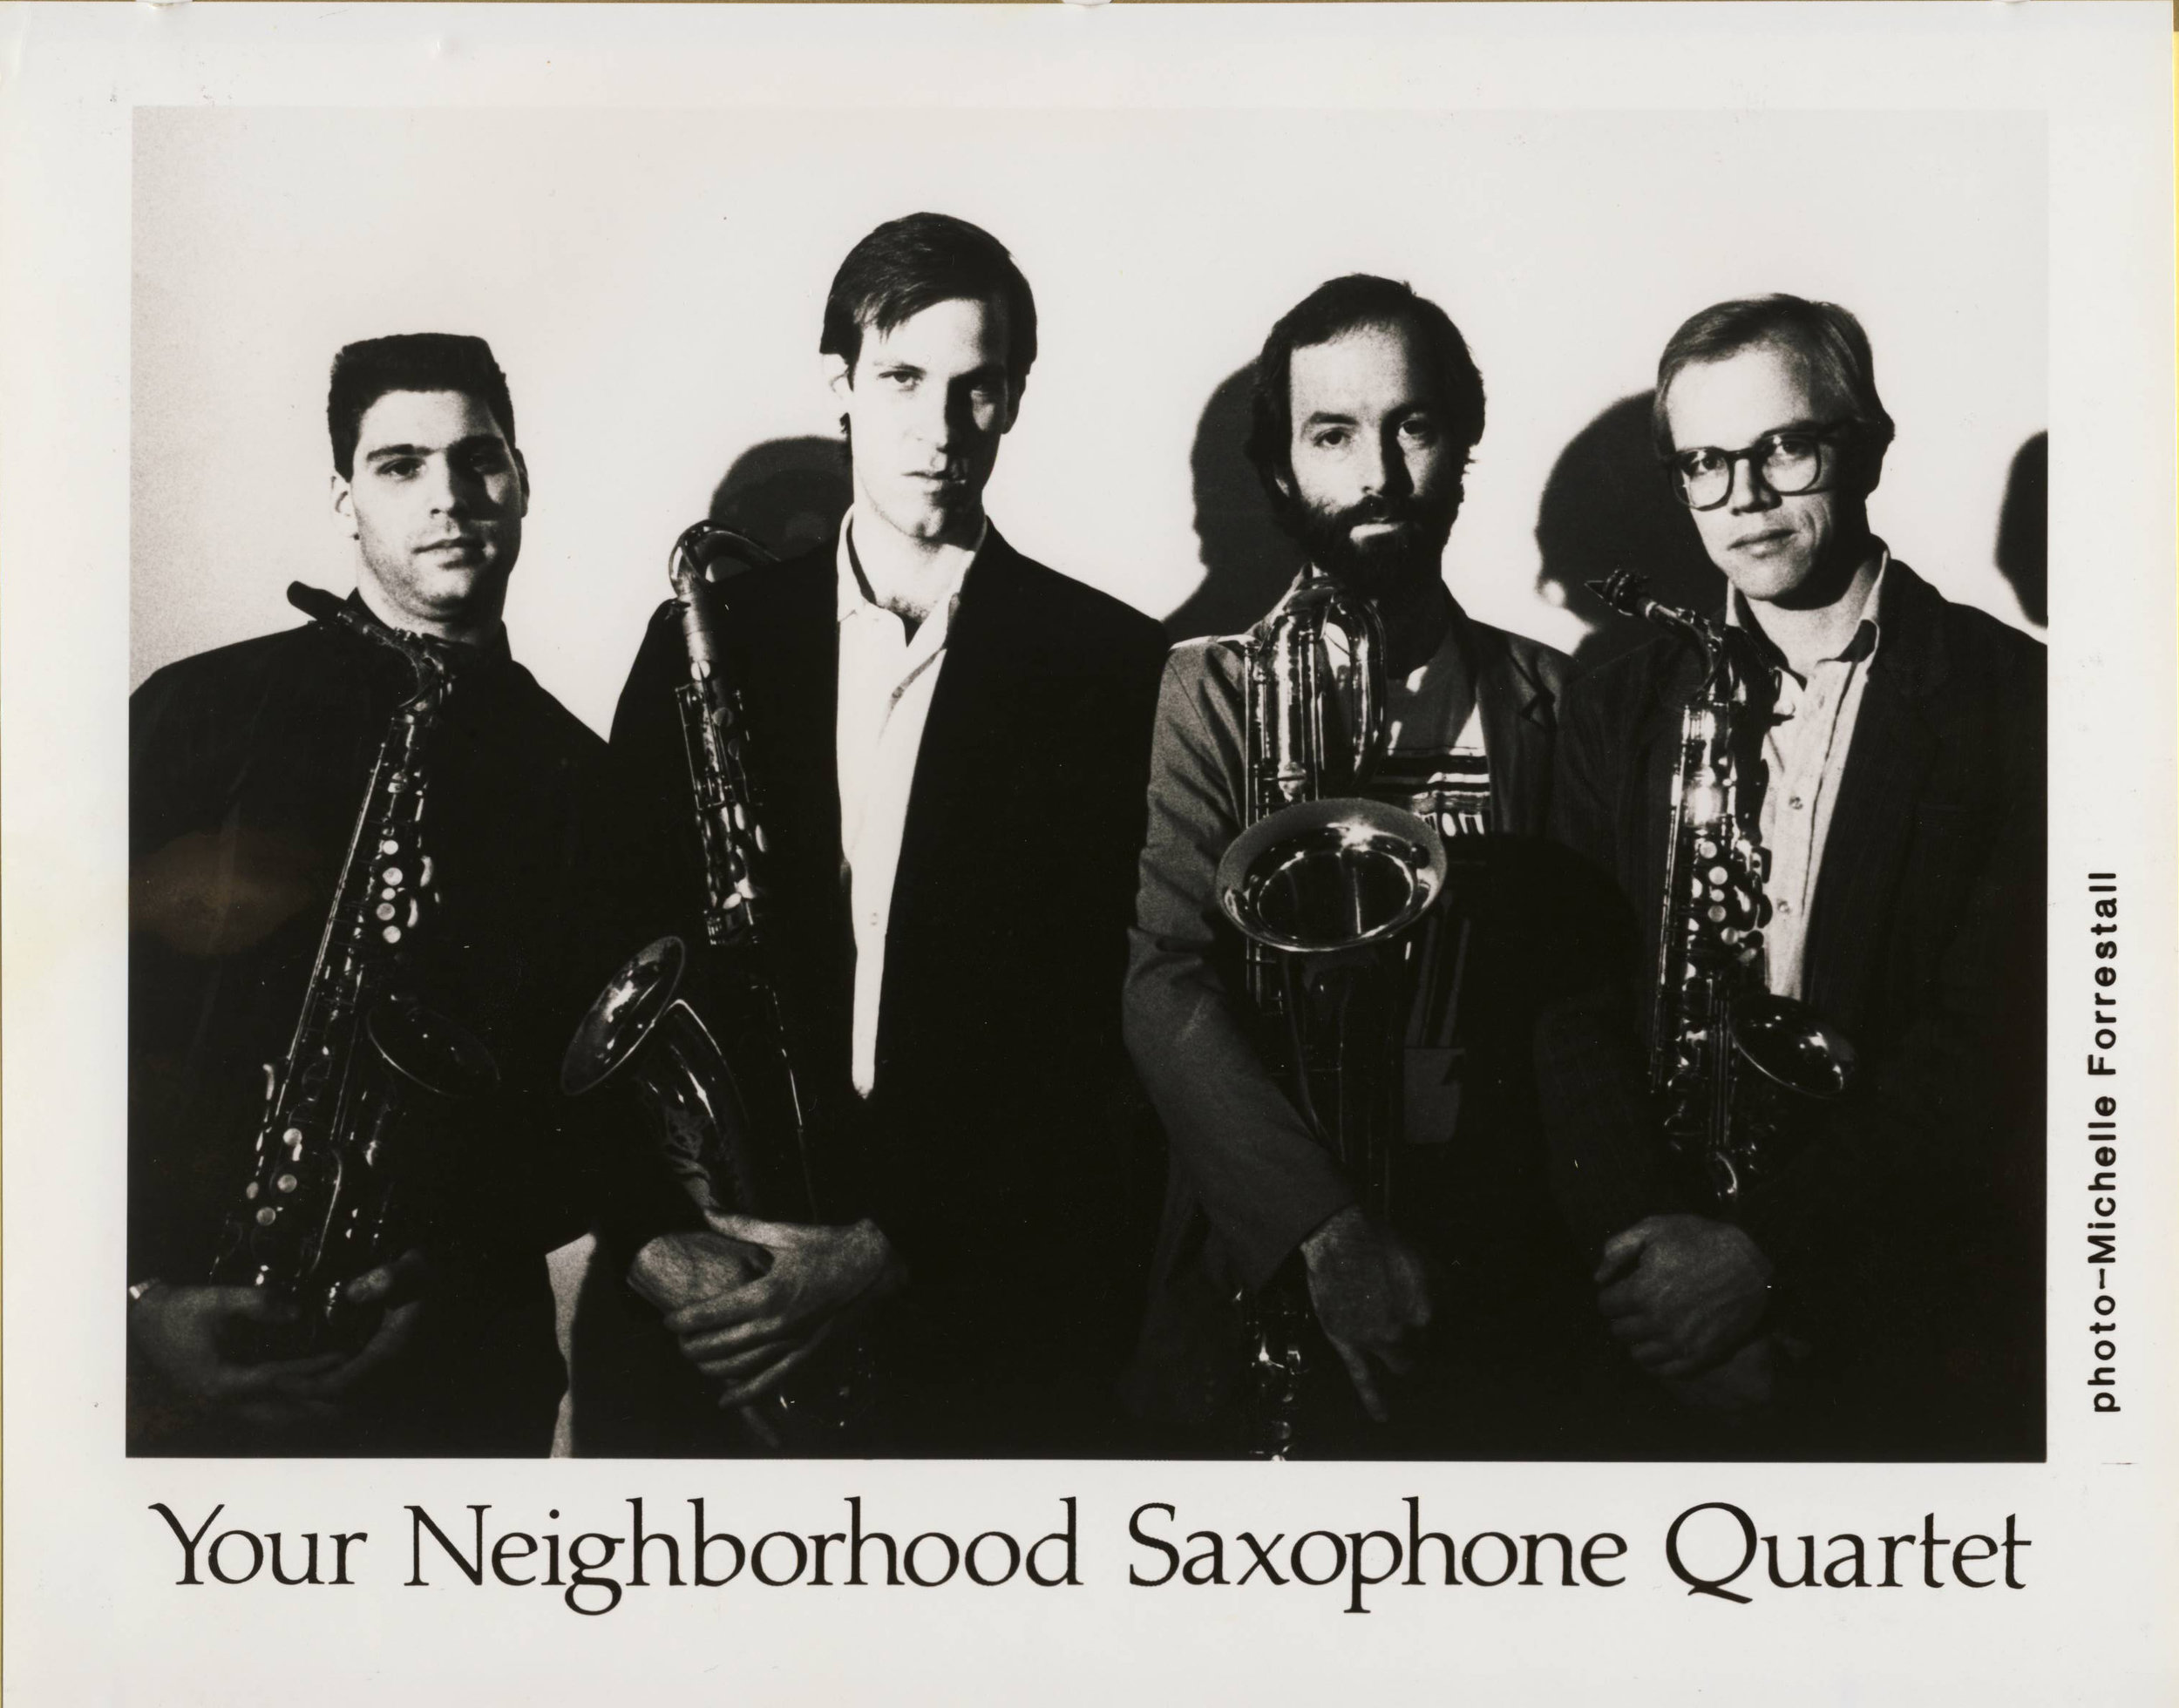 L to R: Ben Schachter, Tom Hall, Steve Adams, Allan Chase, 1987.